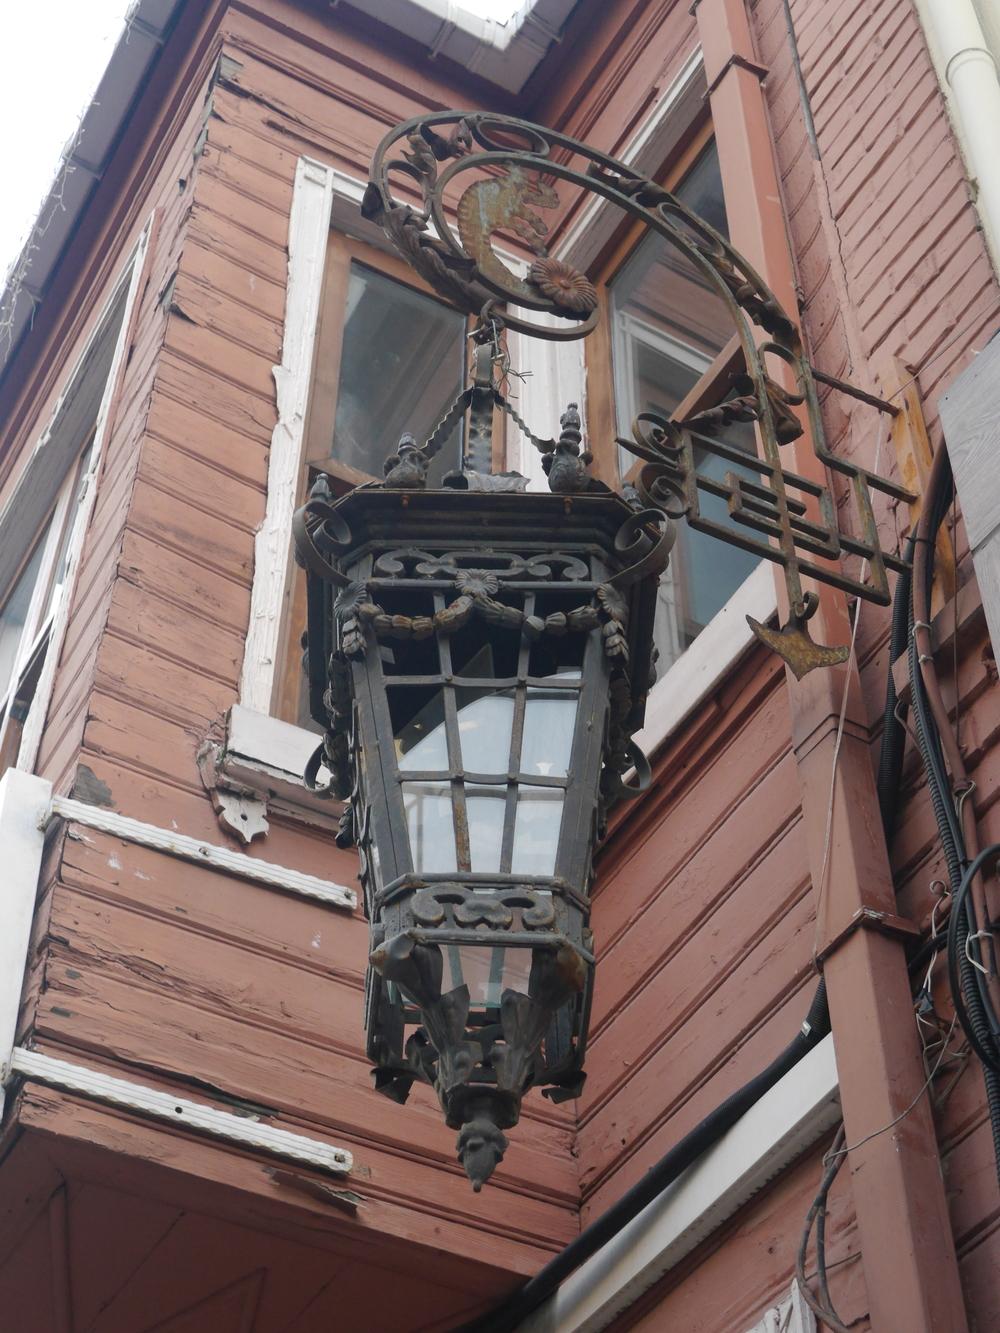 A cool old lantern.